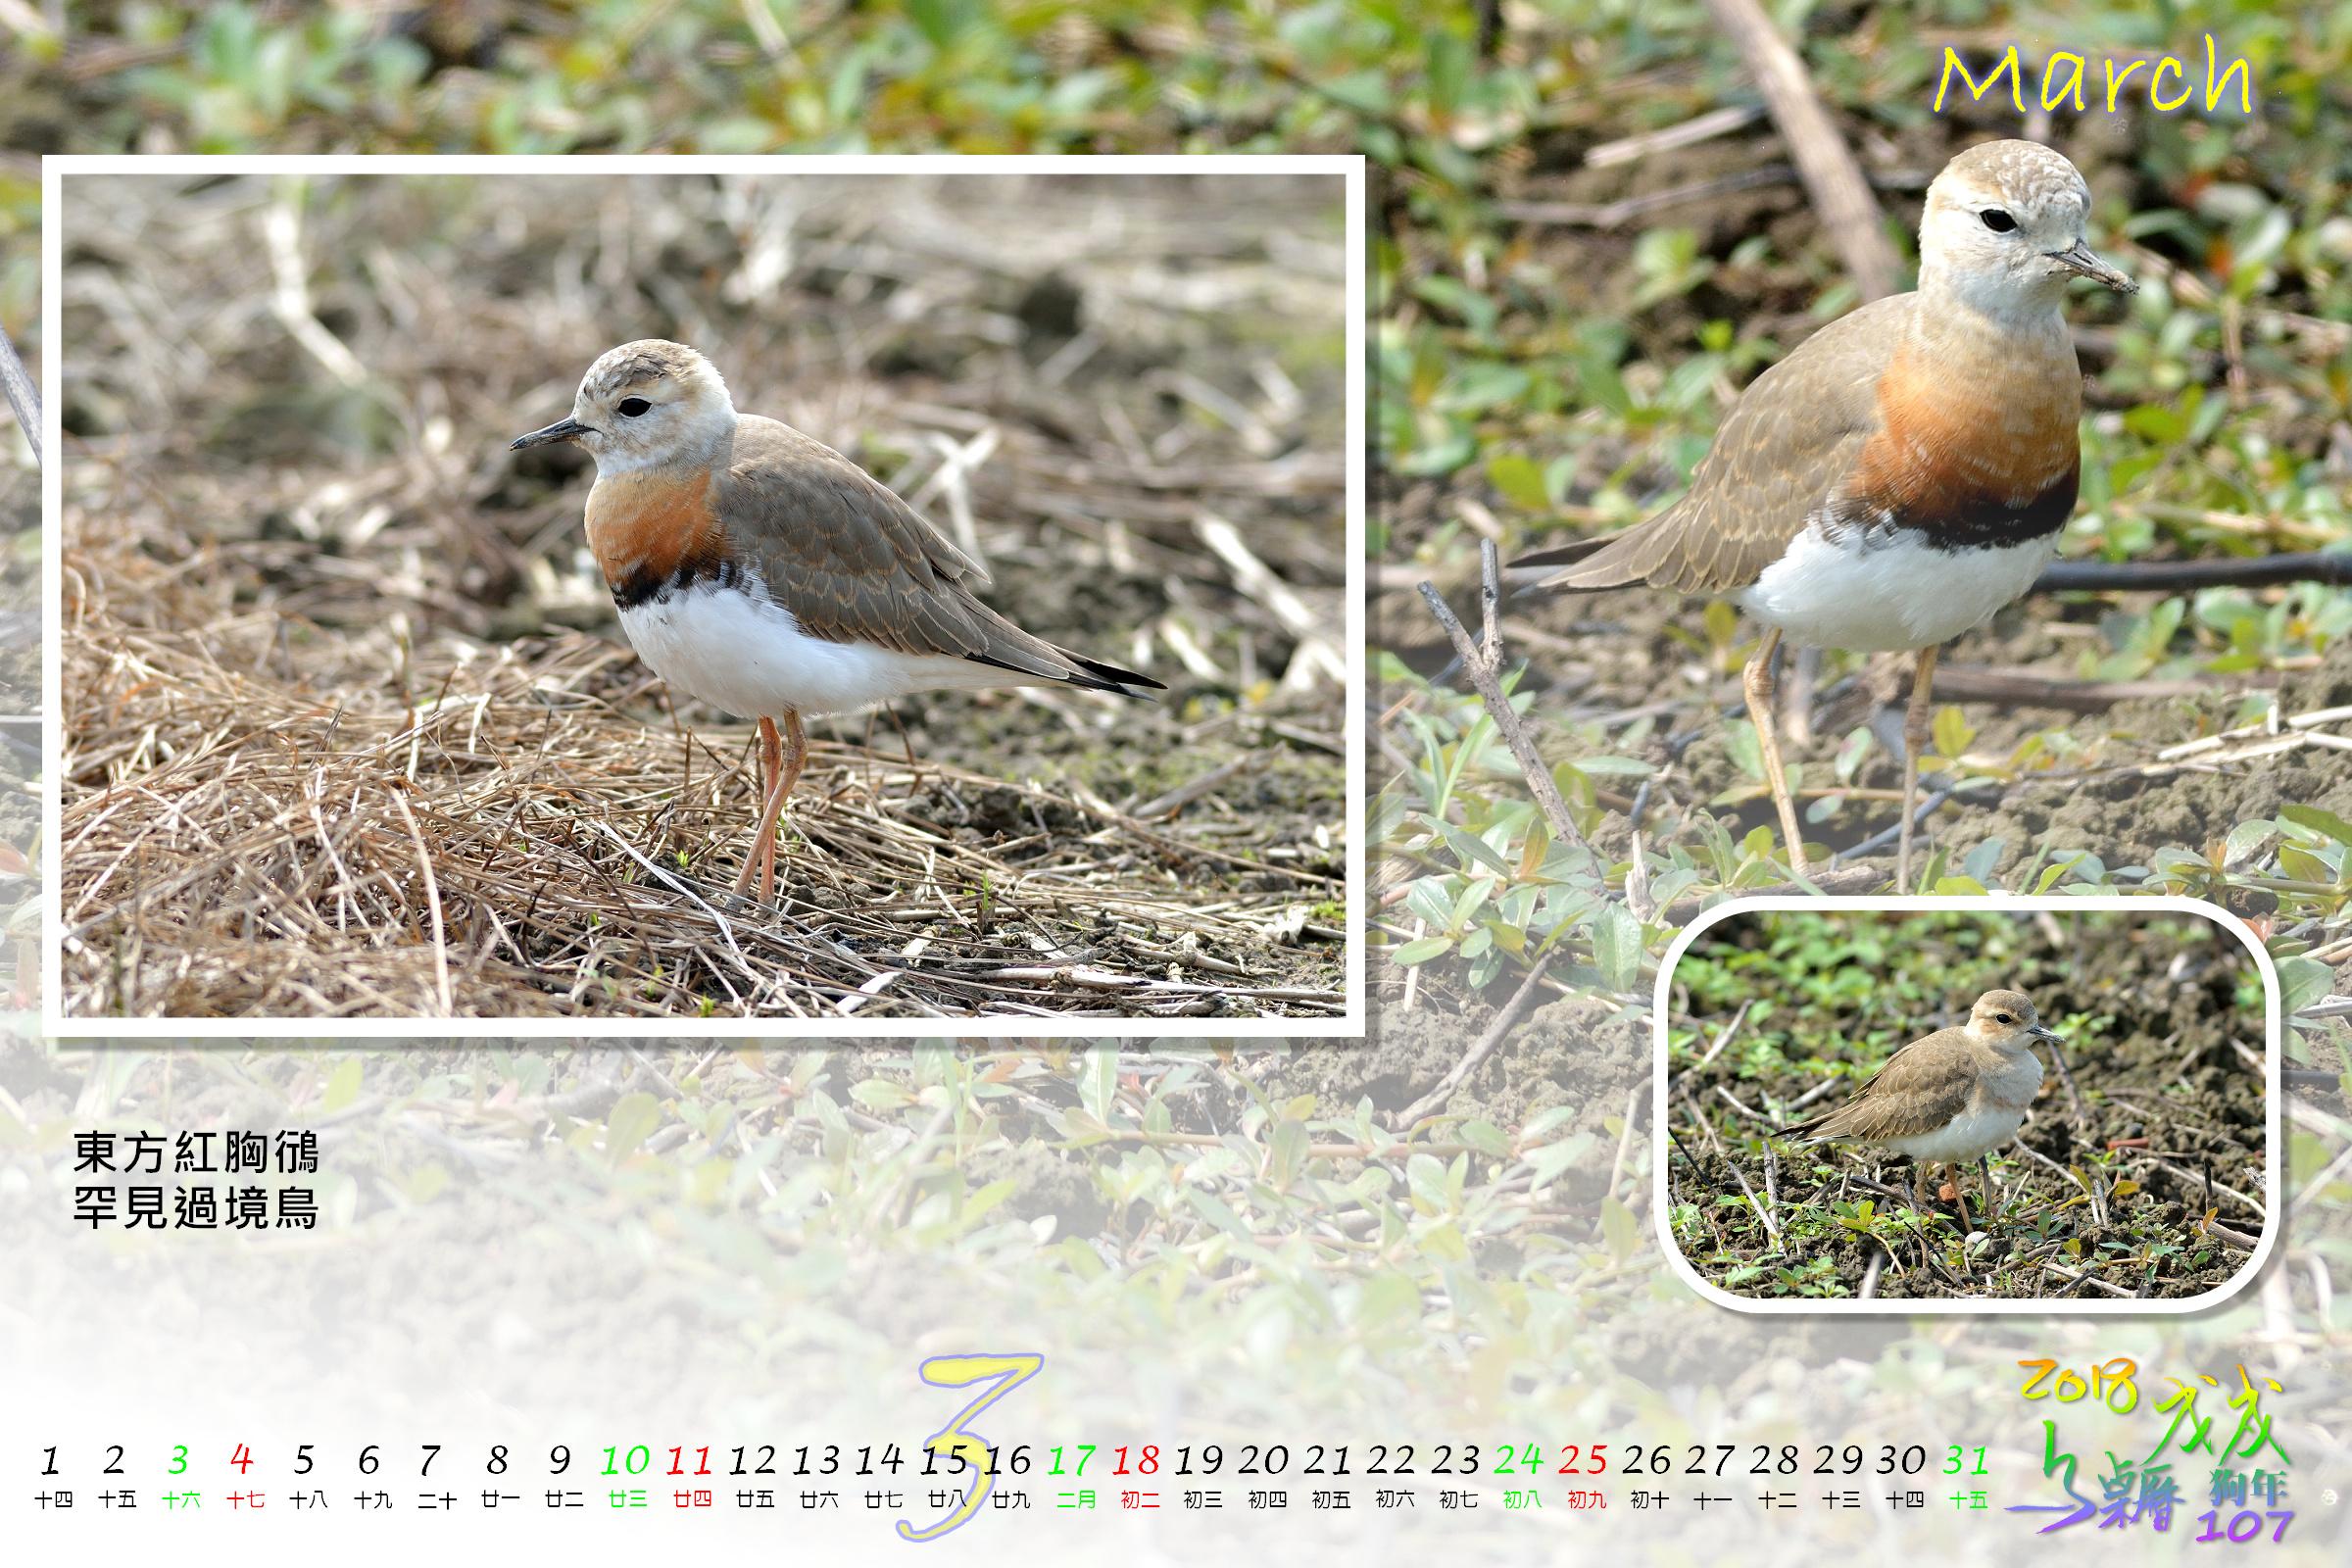 Calendar2018_Alder2_03